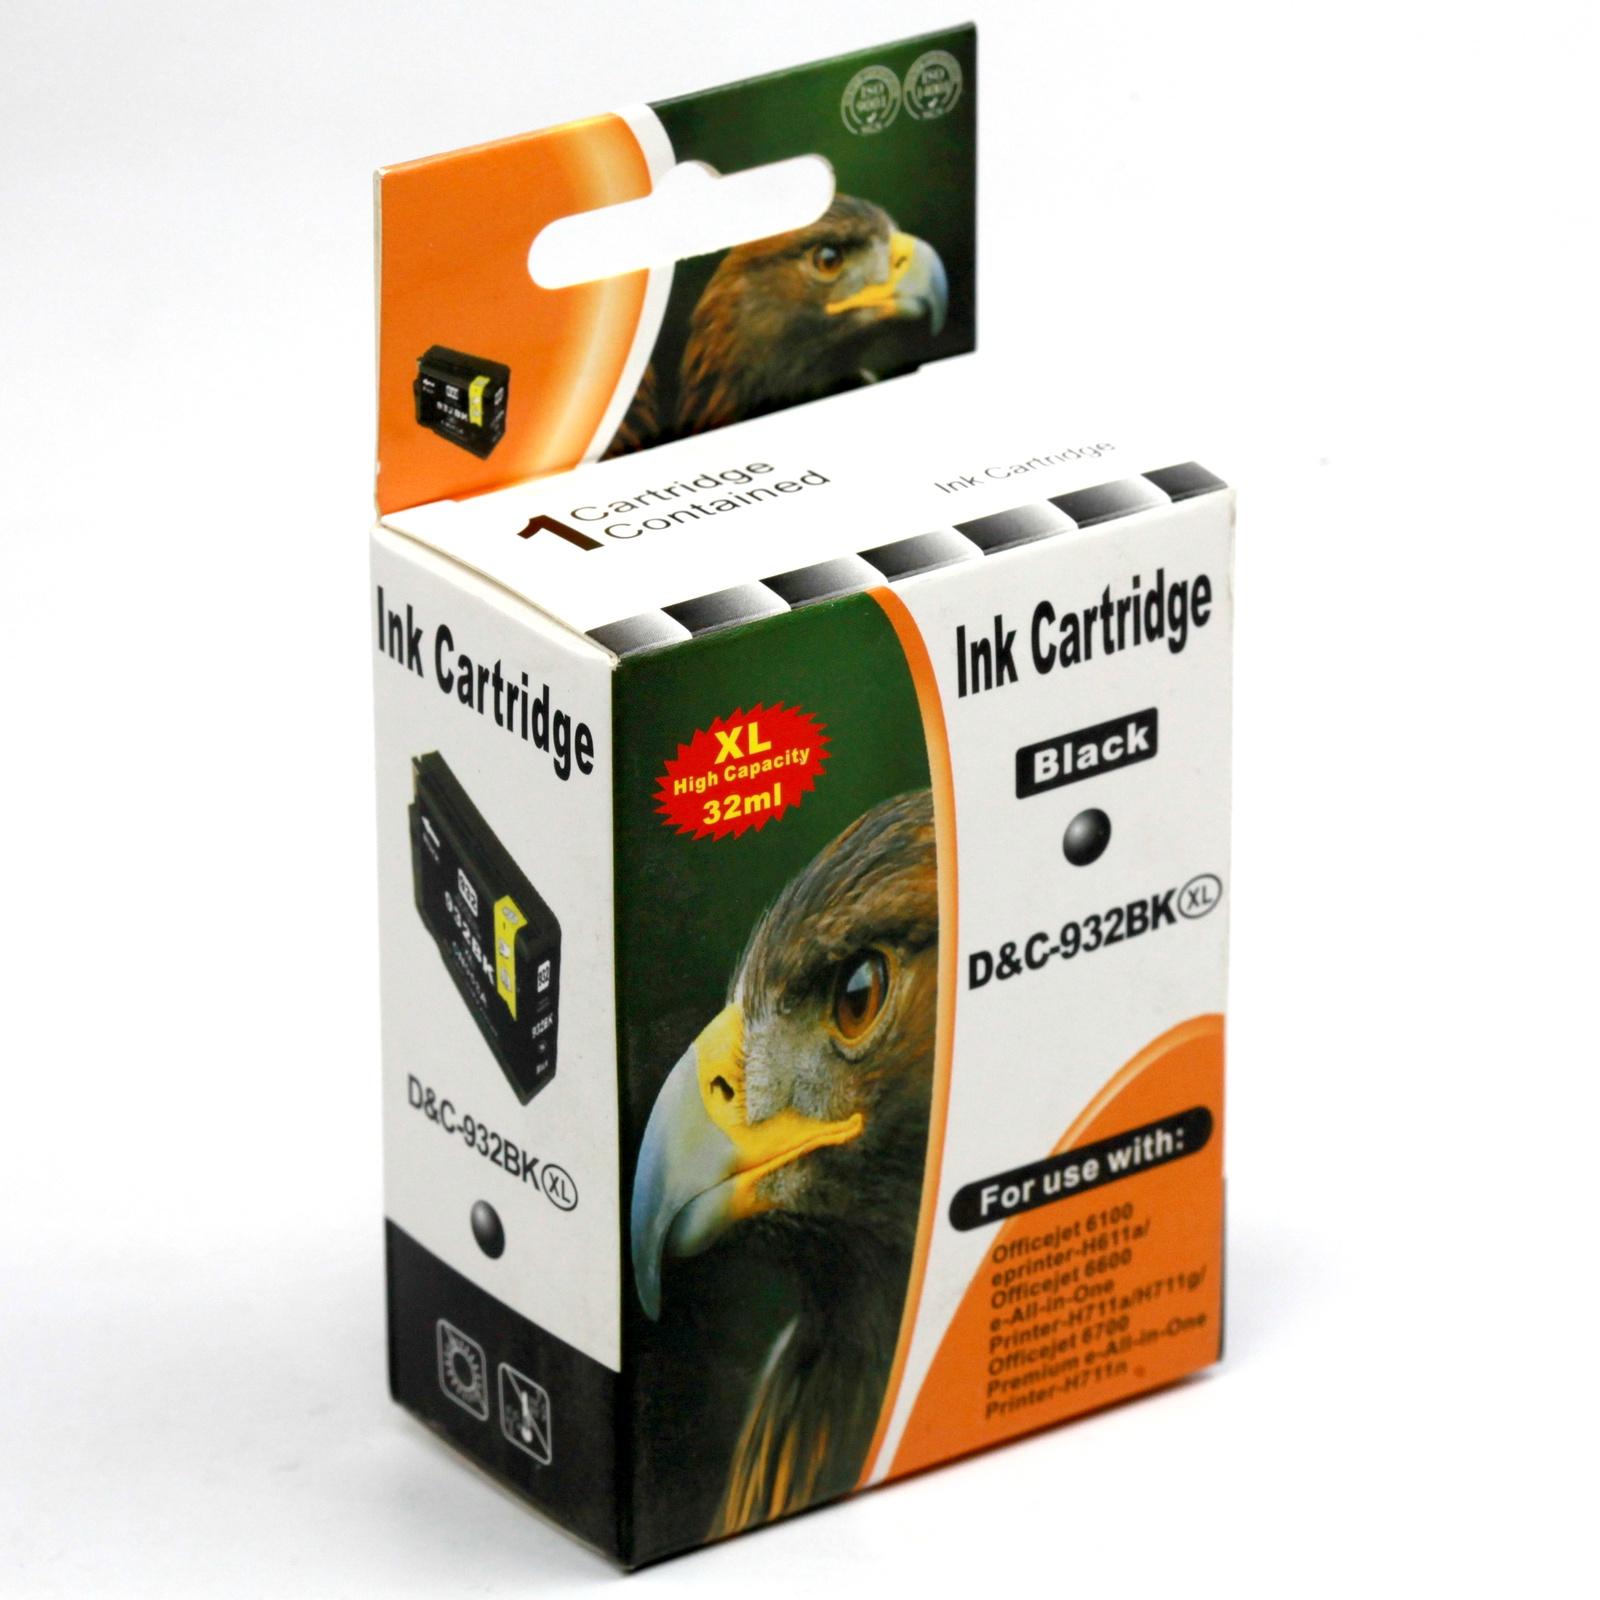 Картридж INKO HP 932 XL OfficeJet 6100, 6600, 6700, 7110, 7610, 7612, 7510 черный printer 7612 hp